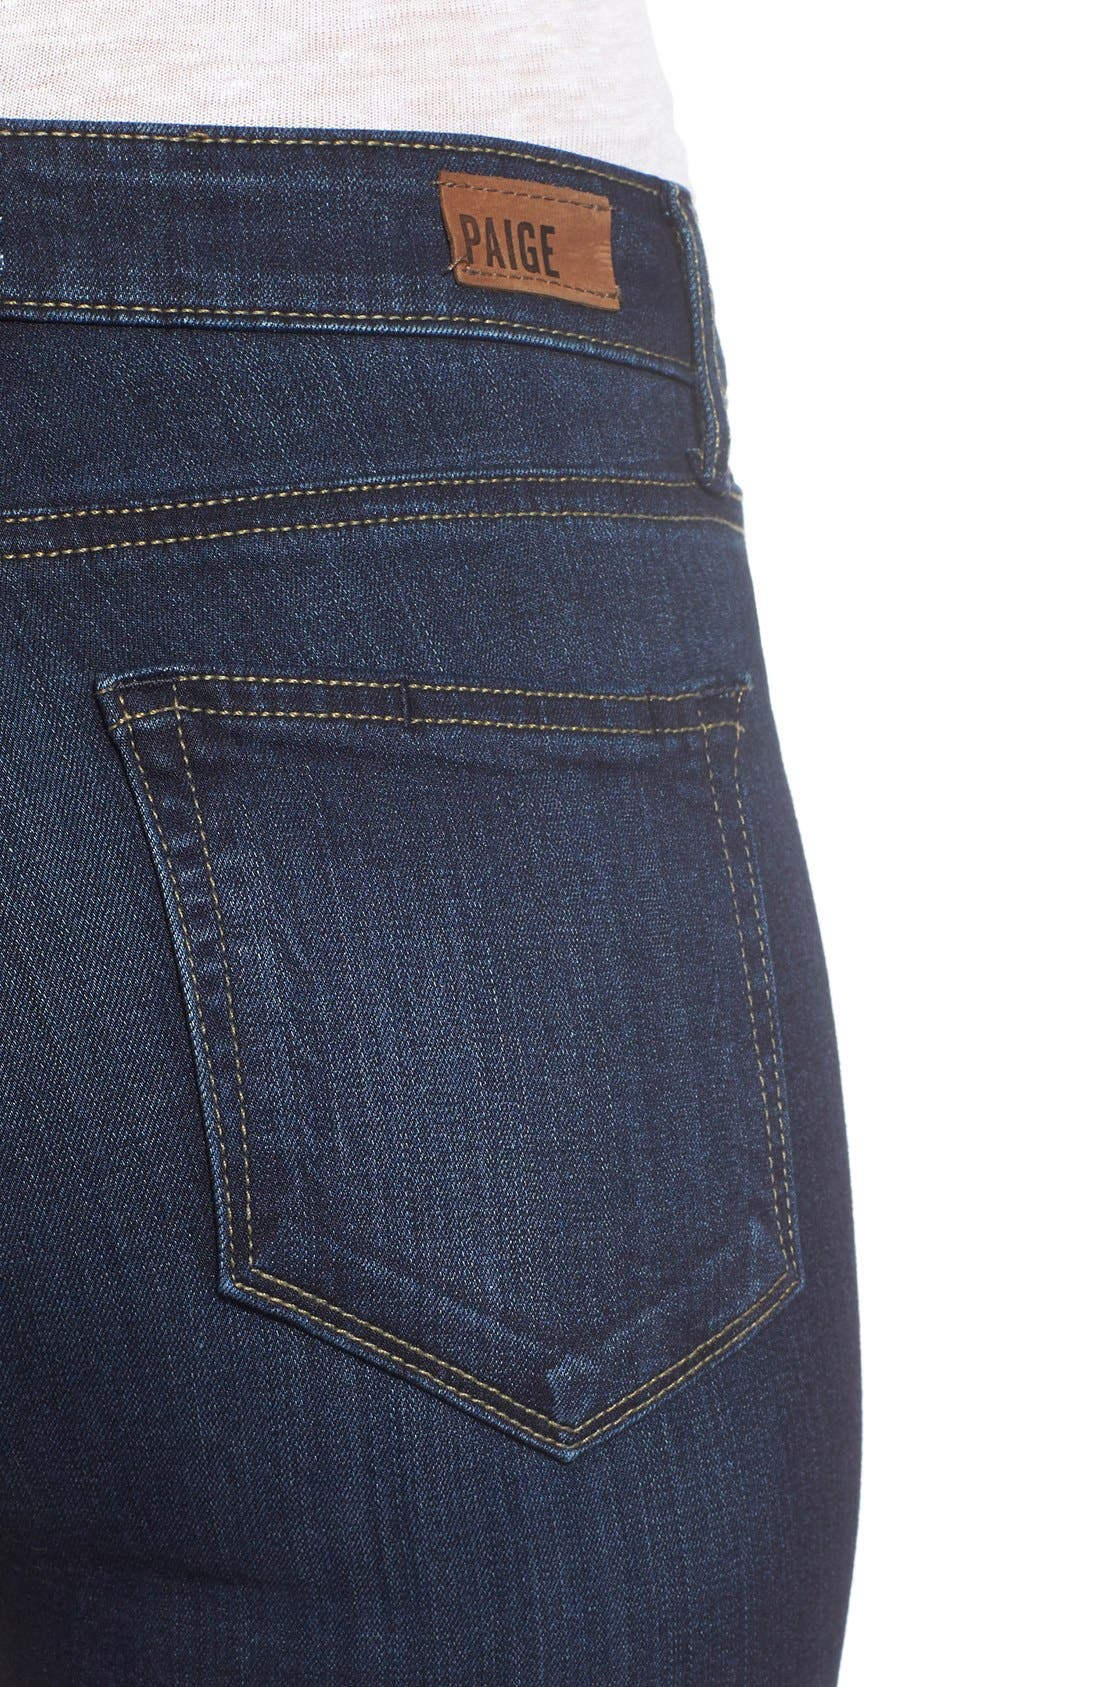 Alternate Image 4  - PAIGE Transcend - Hoxton High Waist Ankle Ultra Skinny Jeans (Hartmann)